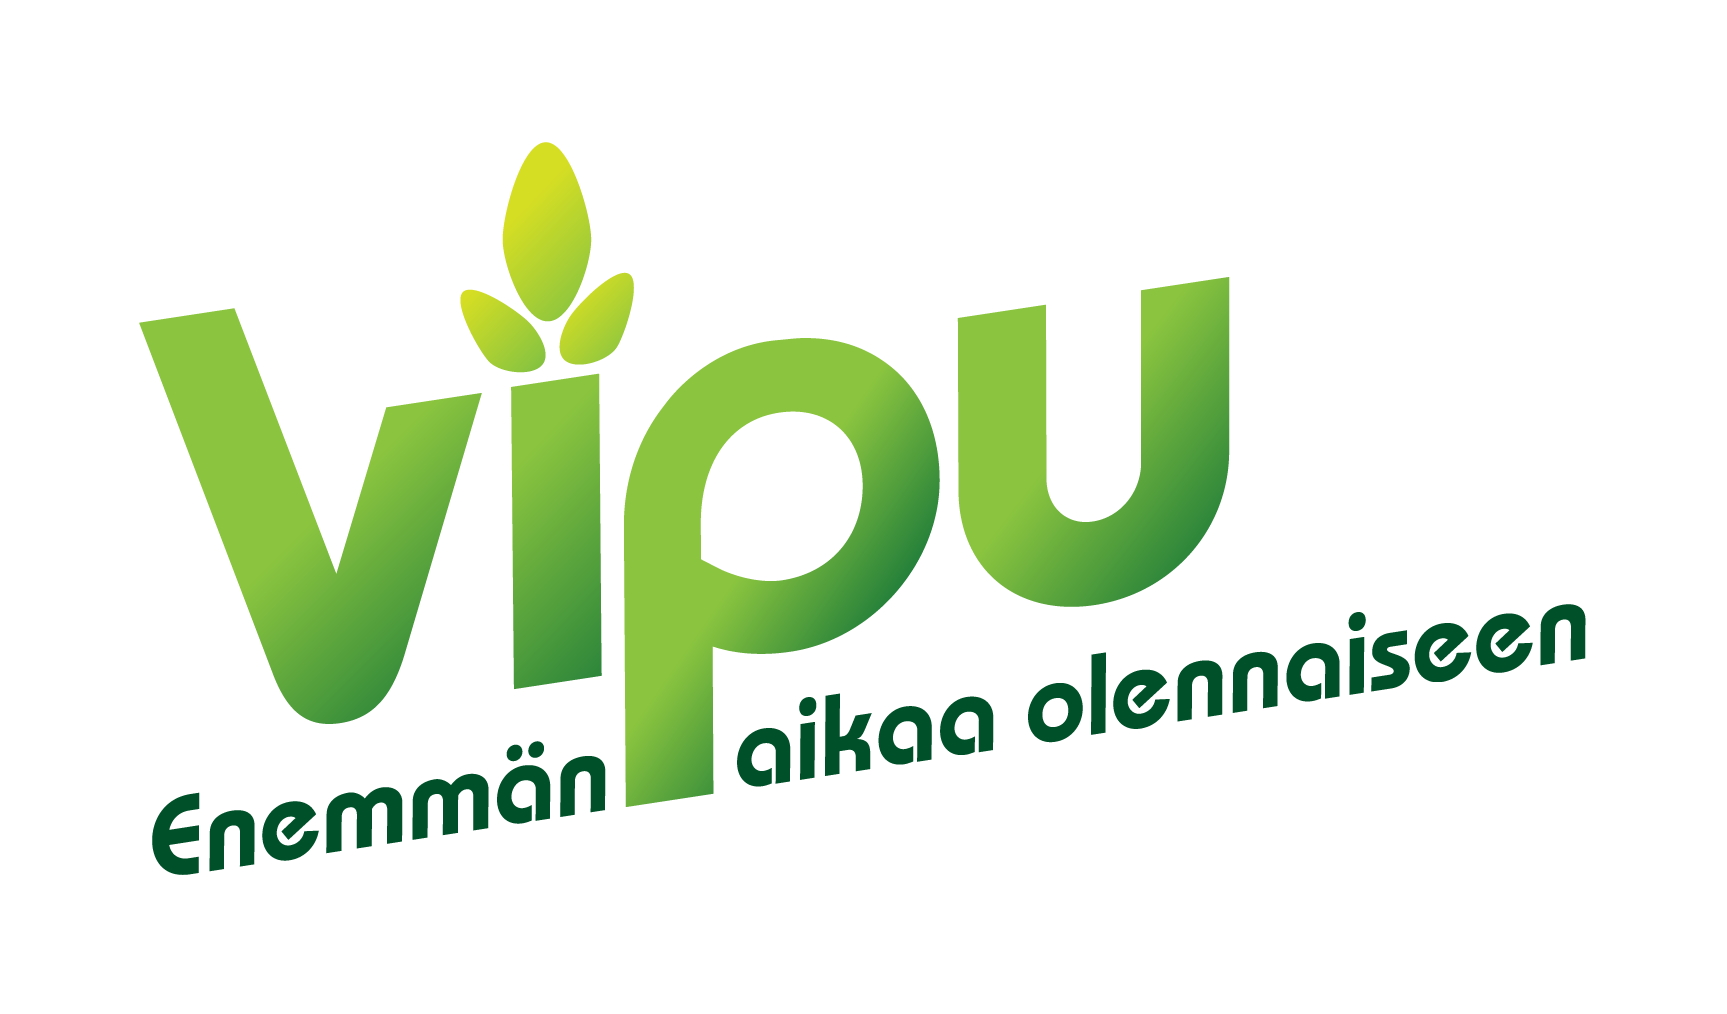 VIPU_enemman_RGB.png